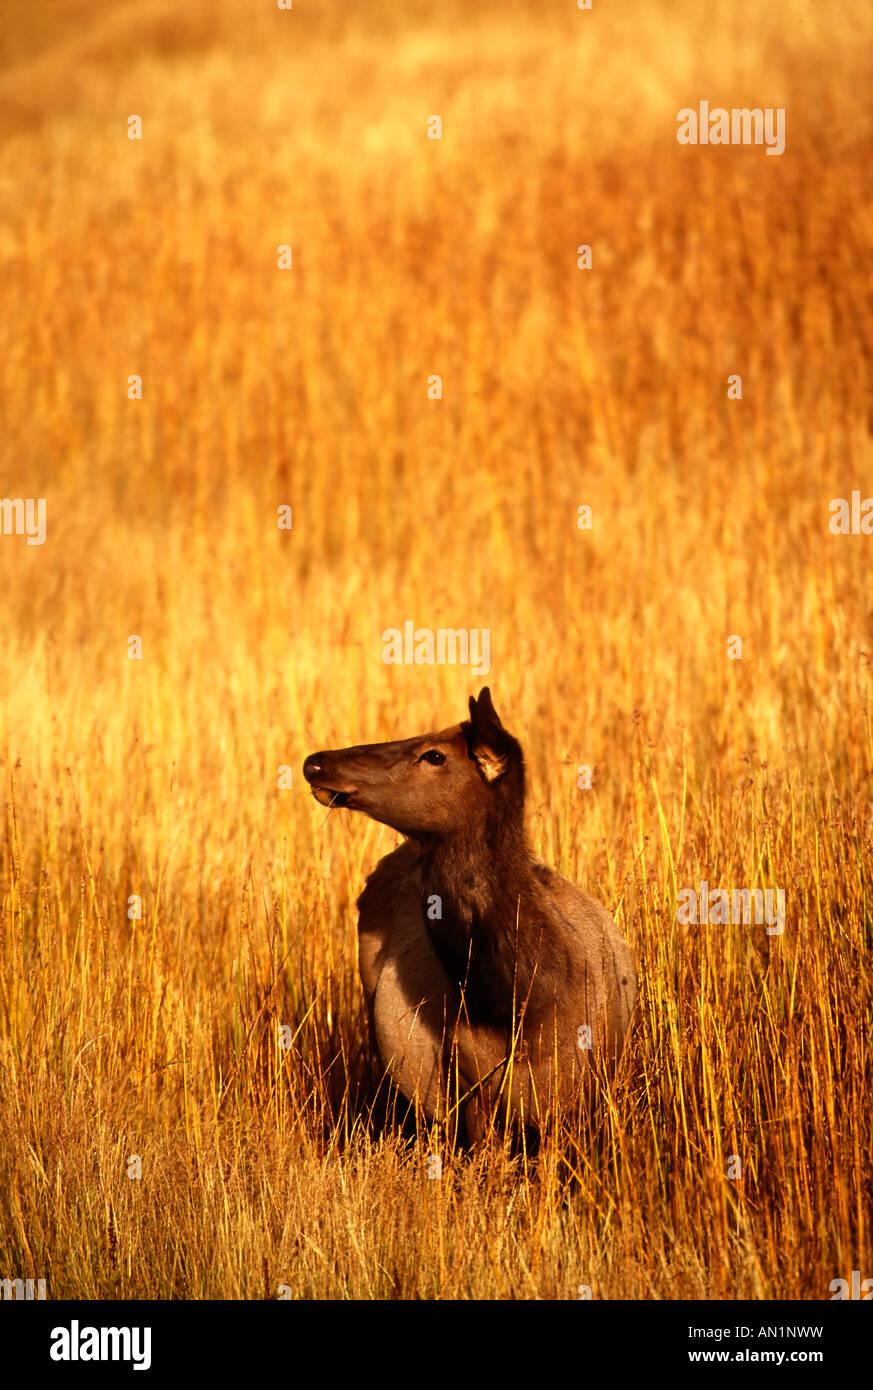 Vache Kuh Weibchen Wapiti Cervus elaphus Yellowstone NP USA Banque D'Images